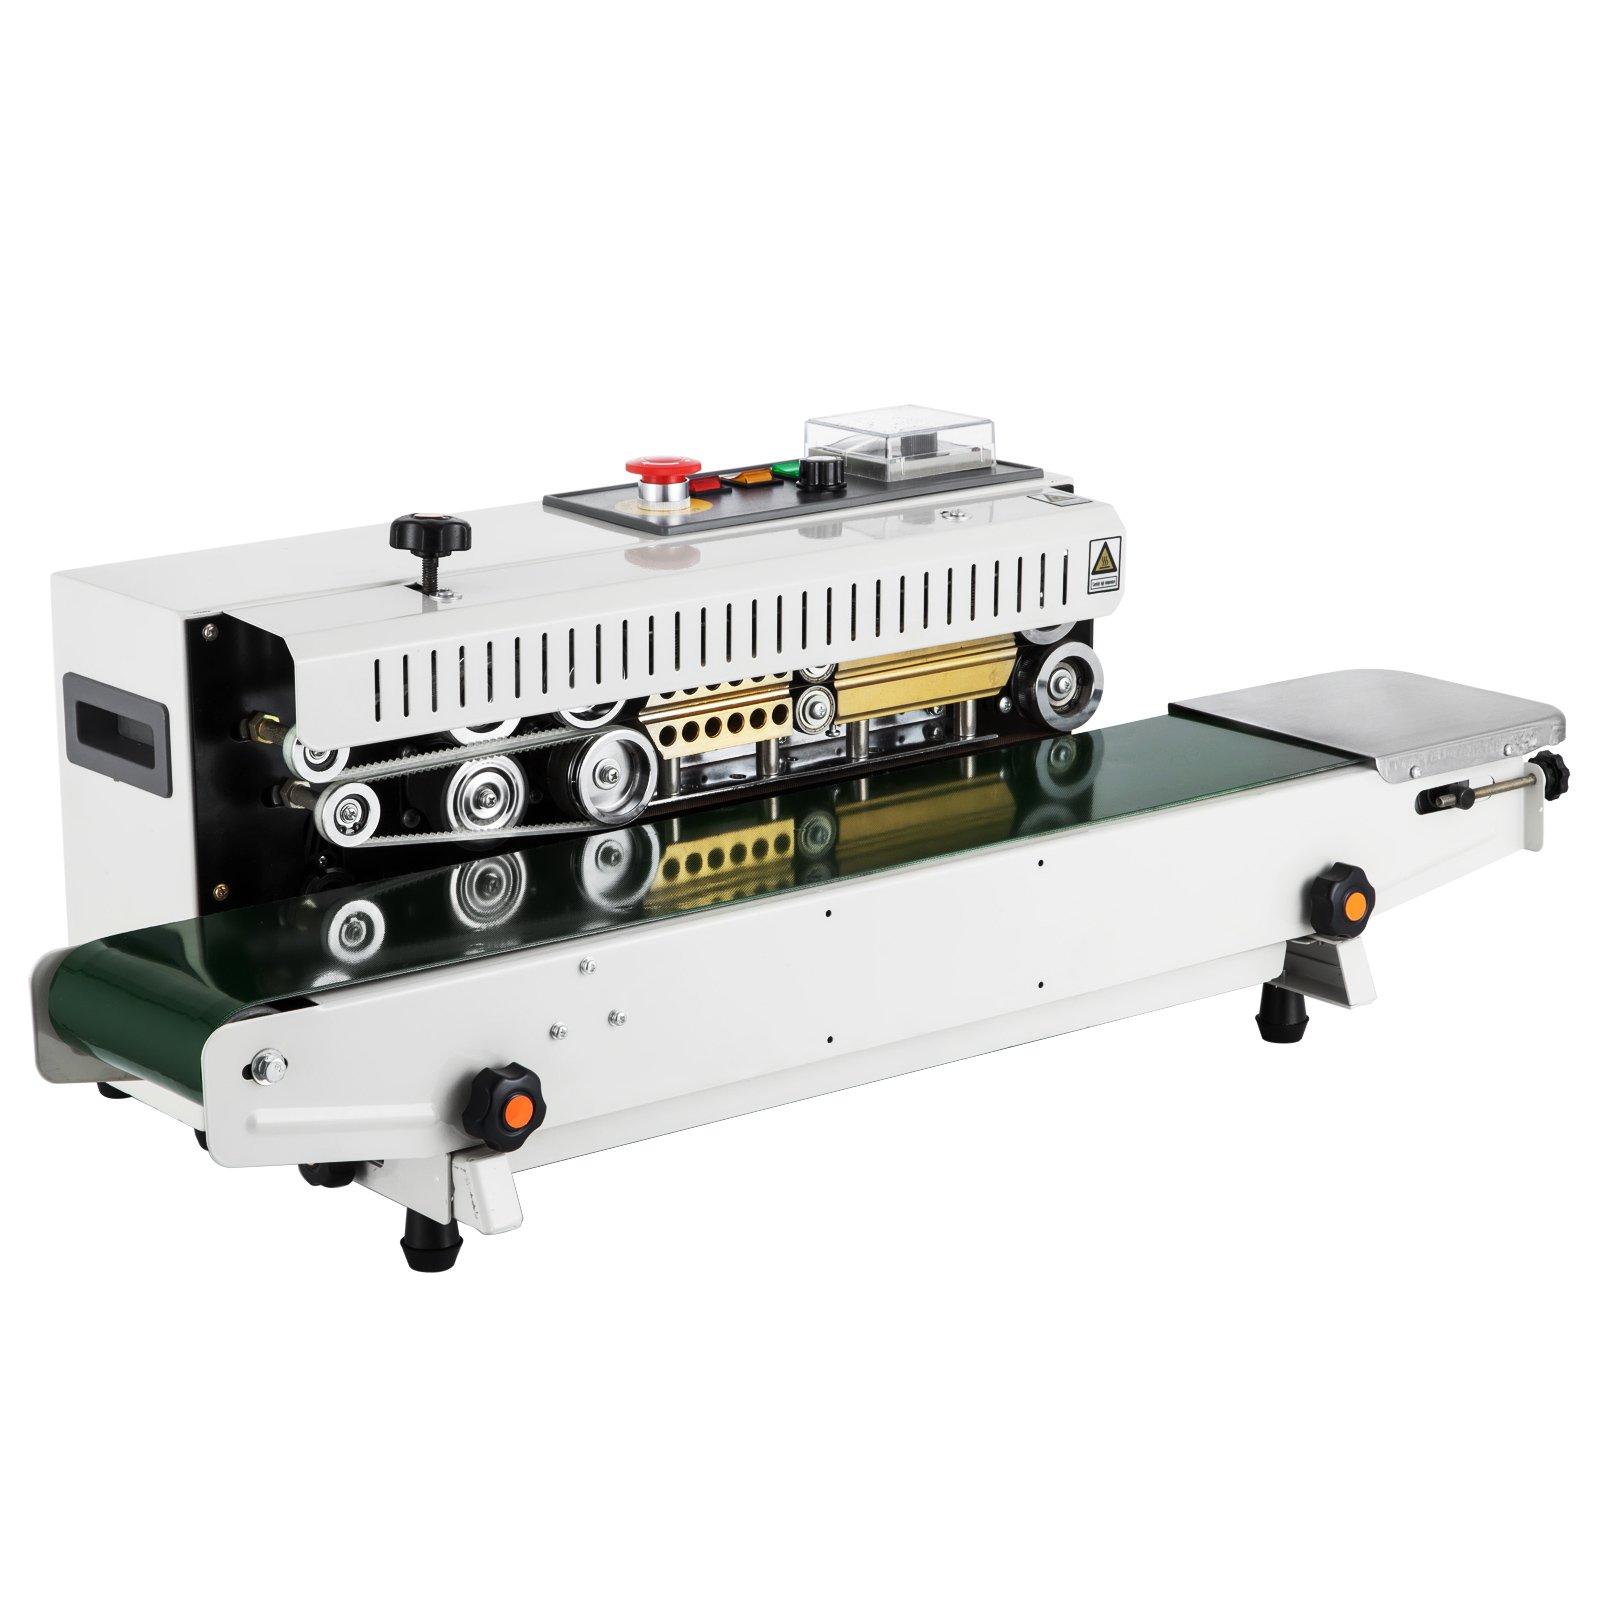 Happybuy Continuous Band Sealer FR-770 Continuous Sealing Machine with Digital Temperature Control Horizontal Sealing Sealer for PVC Membrane Bag Film (FR-770)